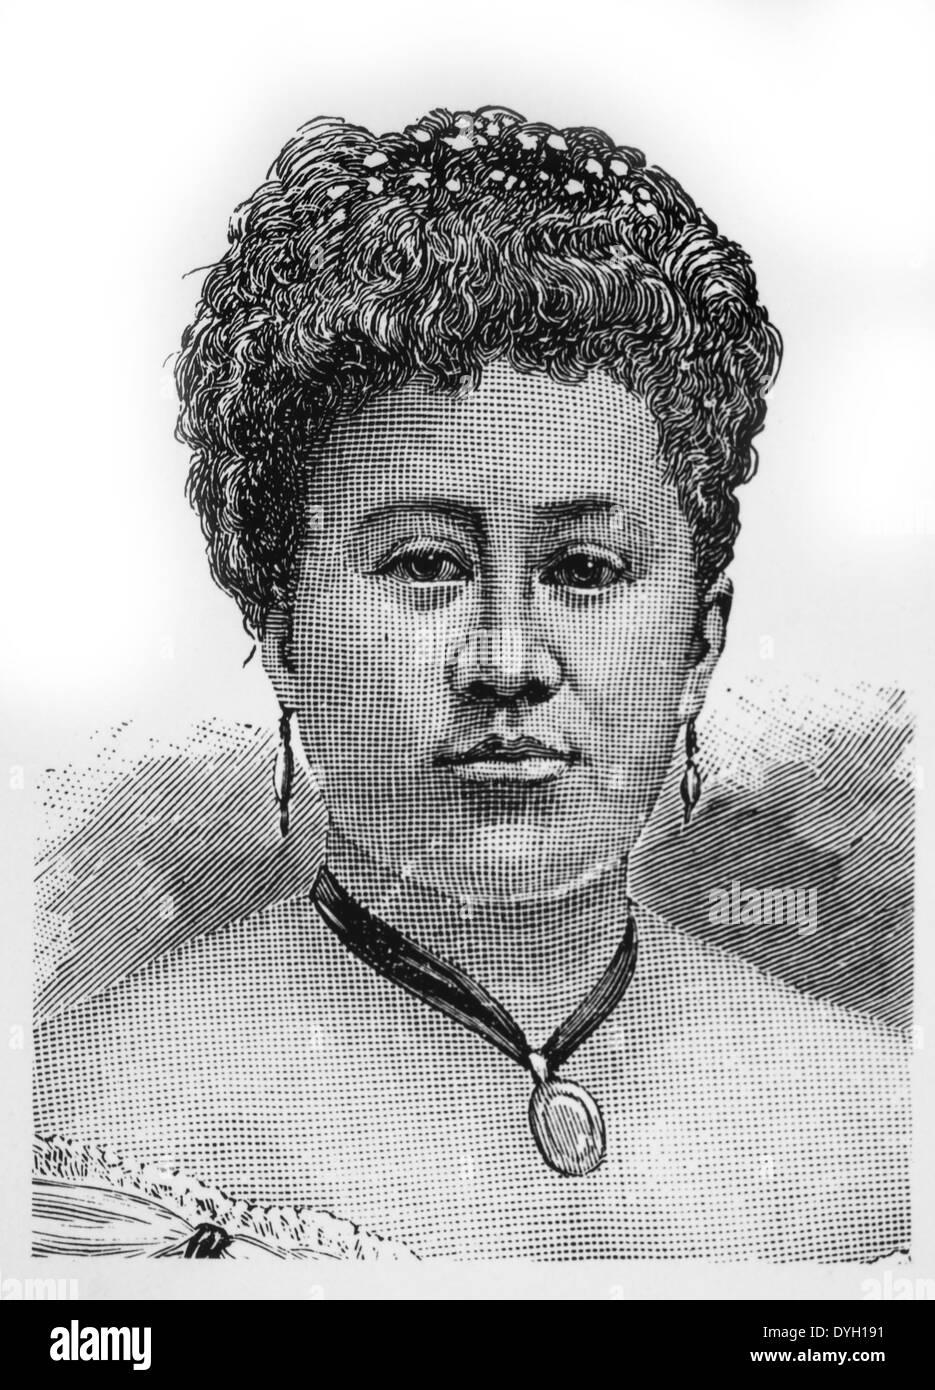 Kapiolani (1834-1899), Queen of the Kingdom of Hawaii, 1874-1891, Portrait - Stock Image